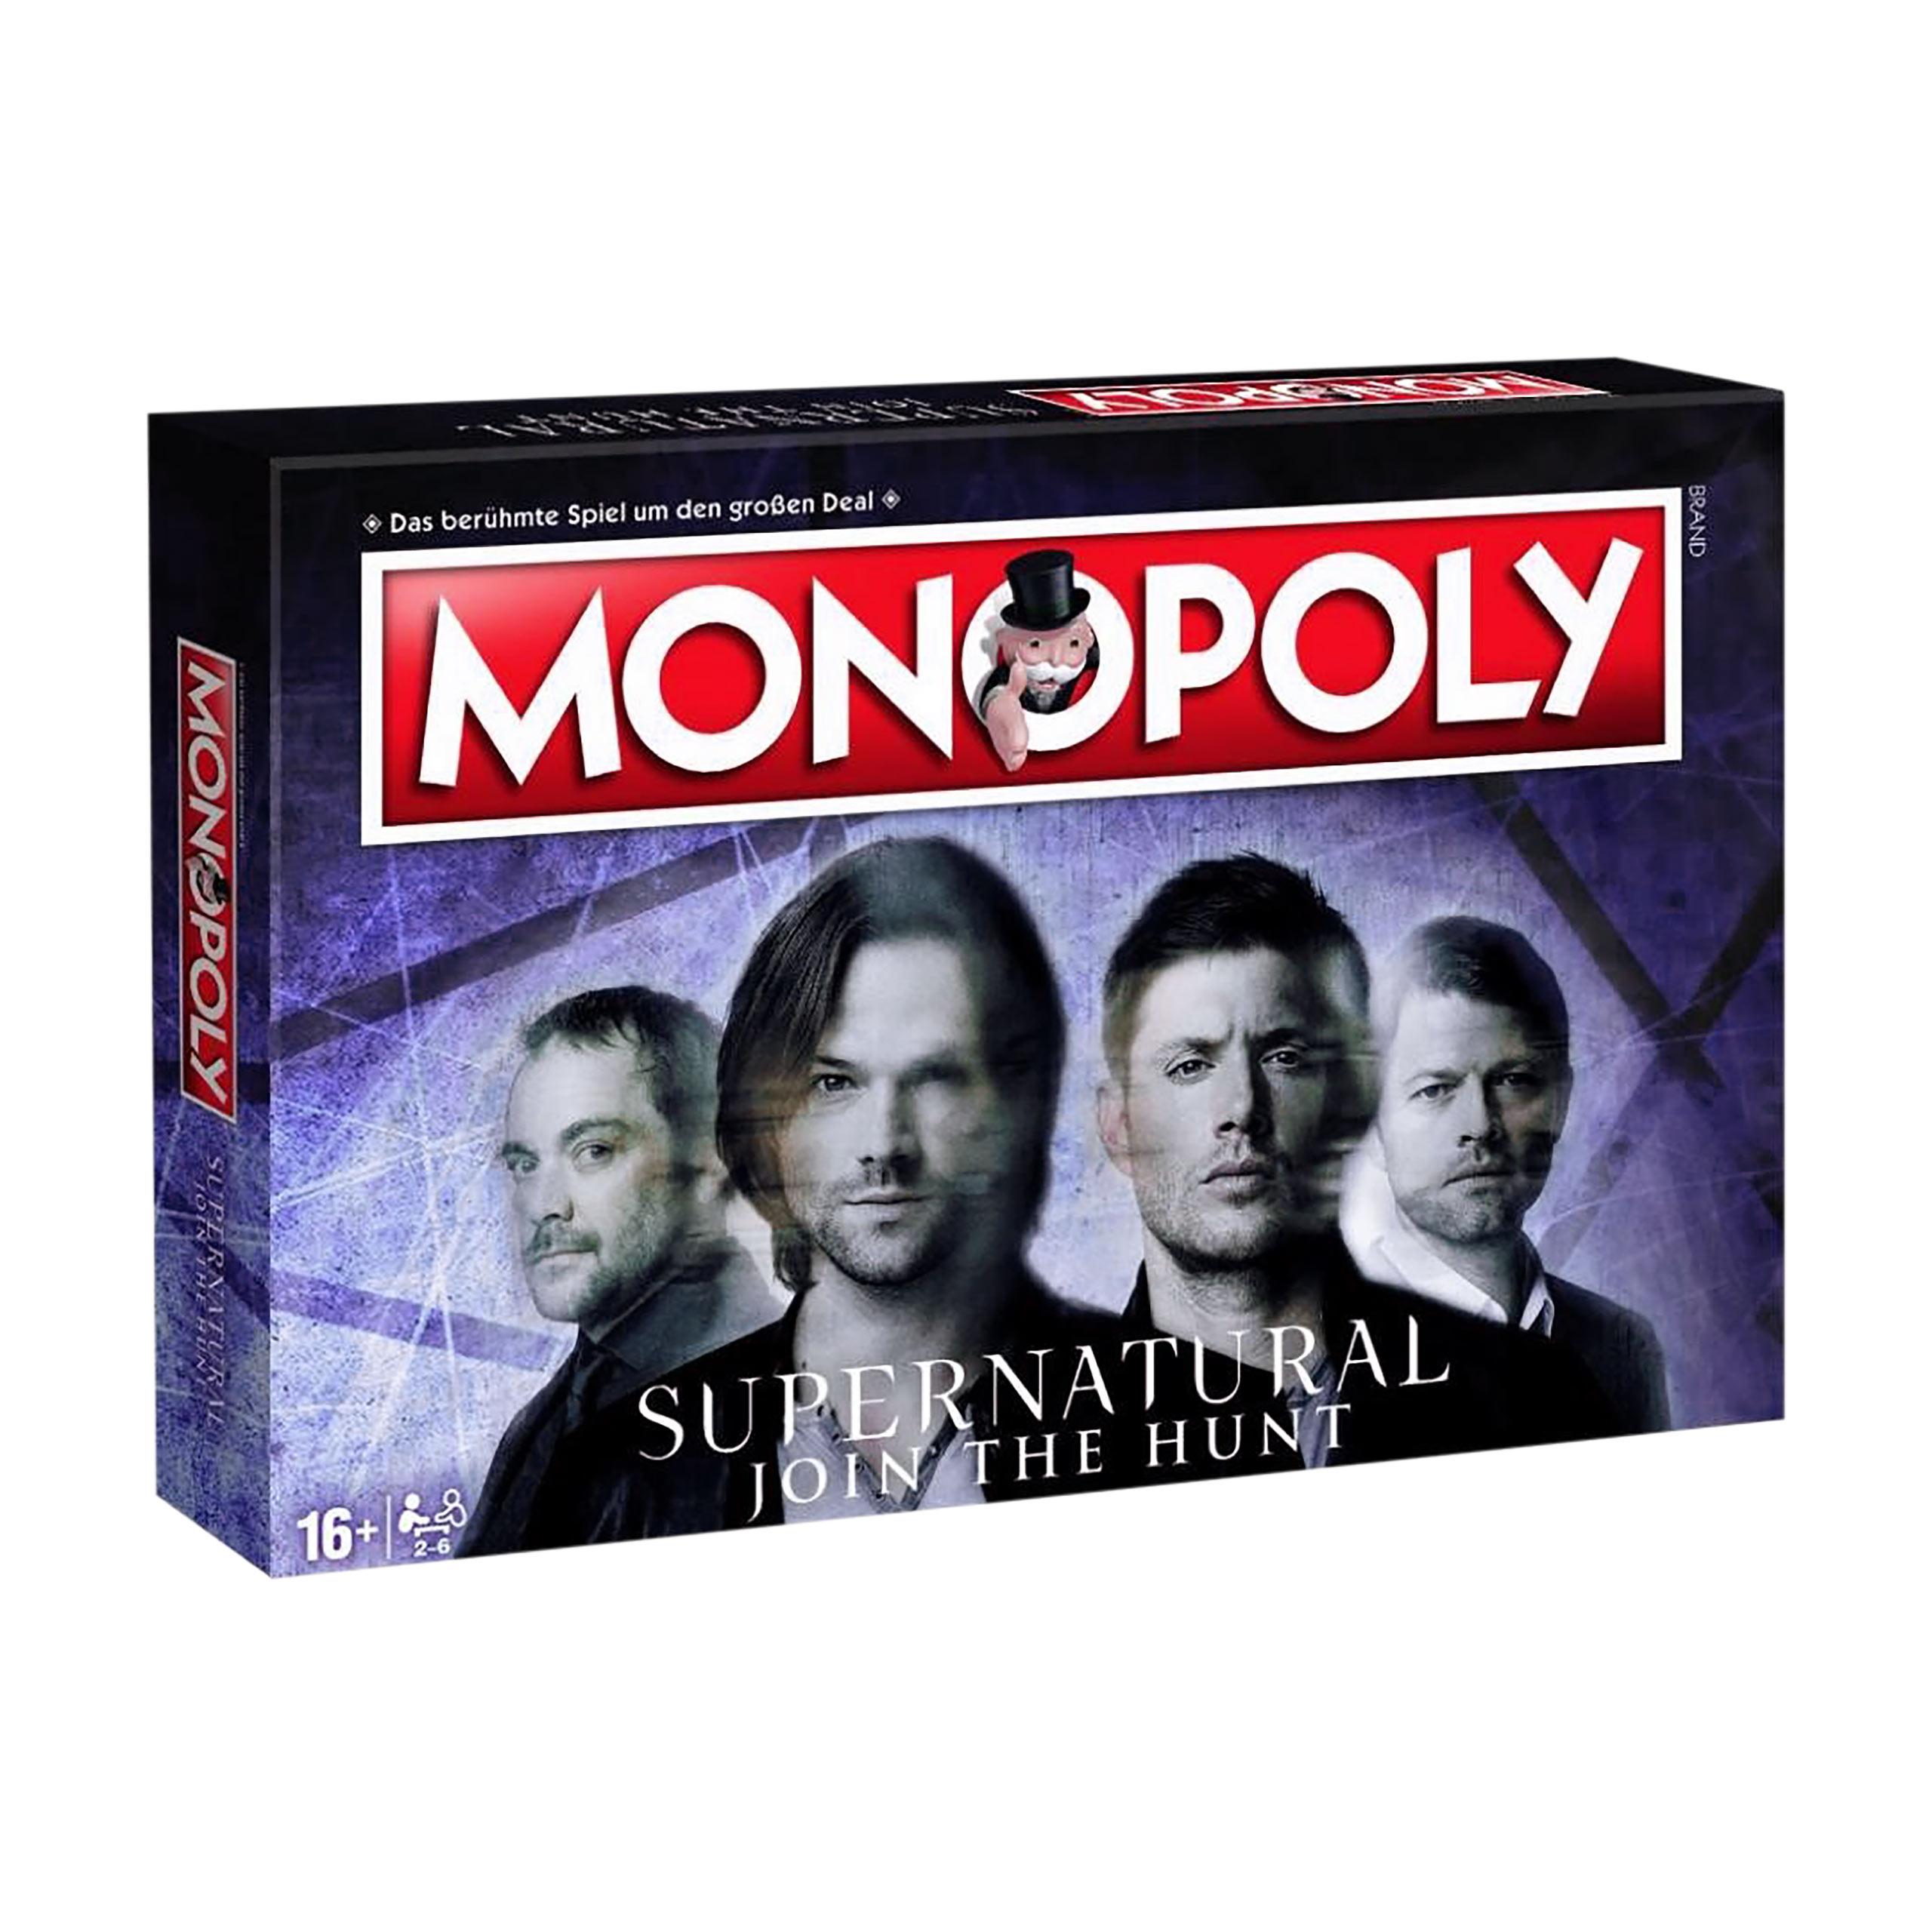 Supernatural - Monopoly